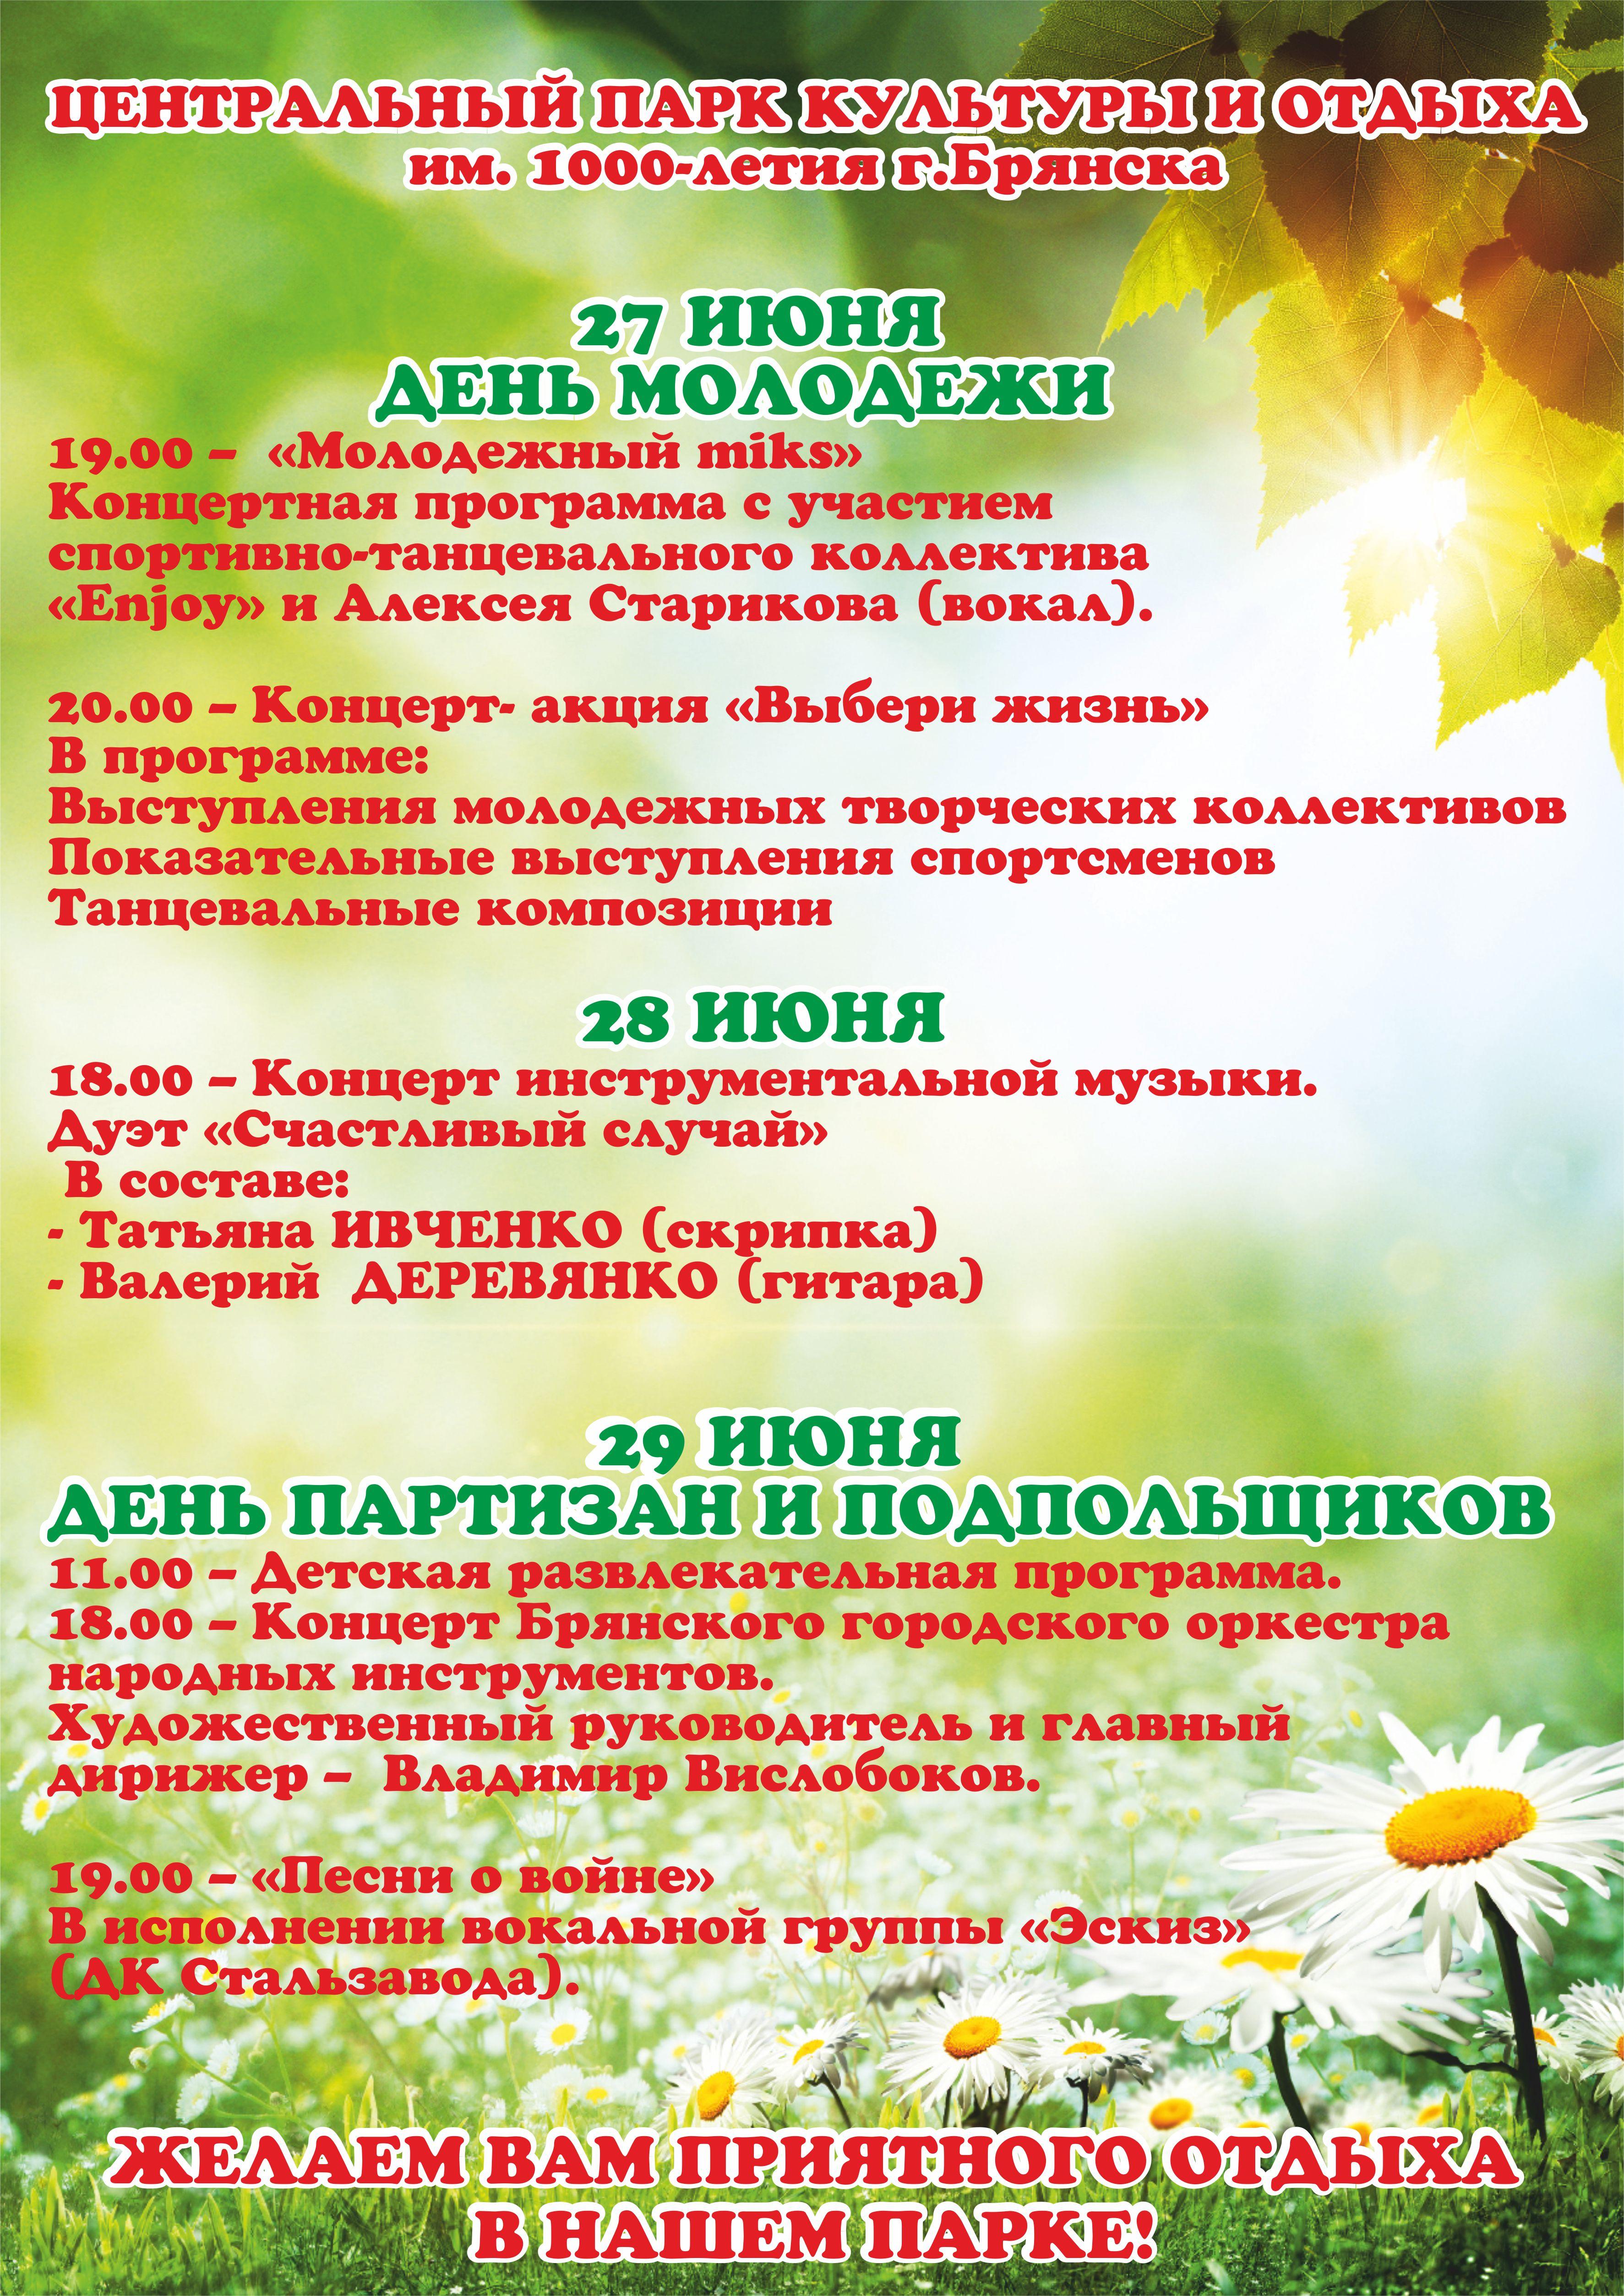 программа мероприятий на 27 — 29 июня 2014 года